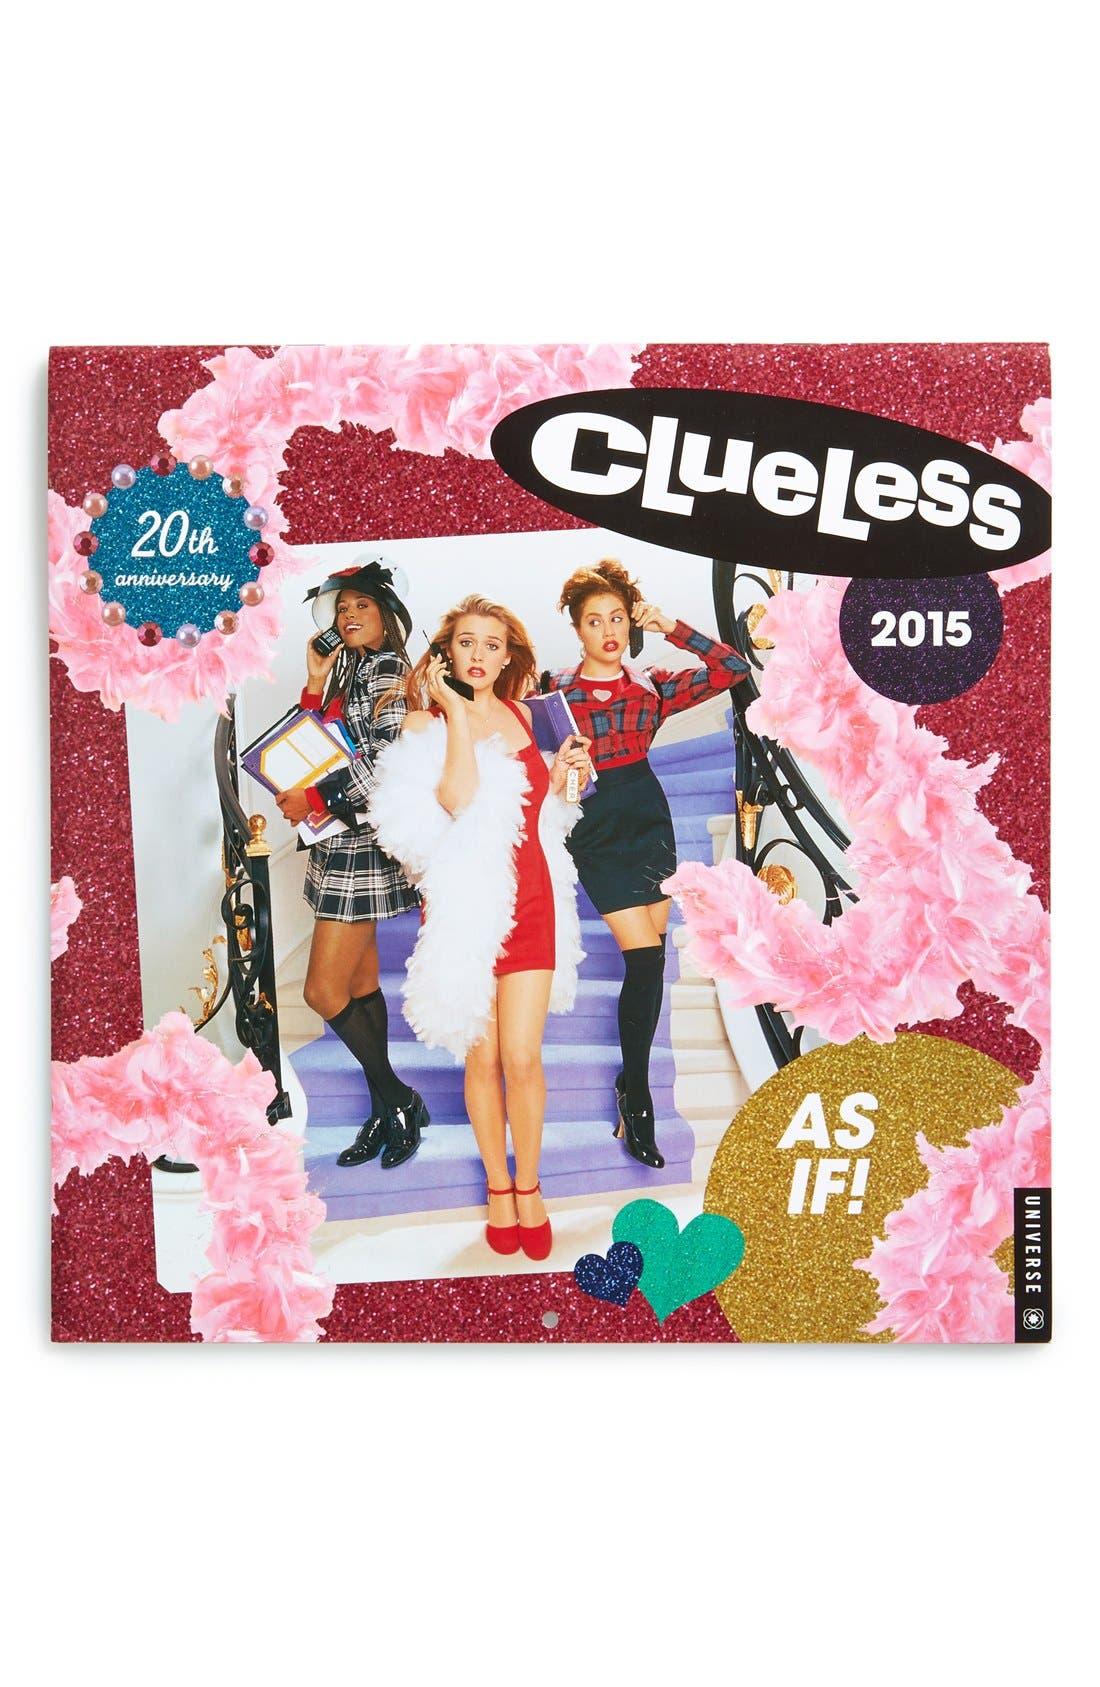 Universe Publishing 'Clueless - 20th Anniversary' 2015 Wall Calendar, Main, color, 650